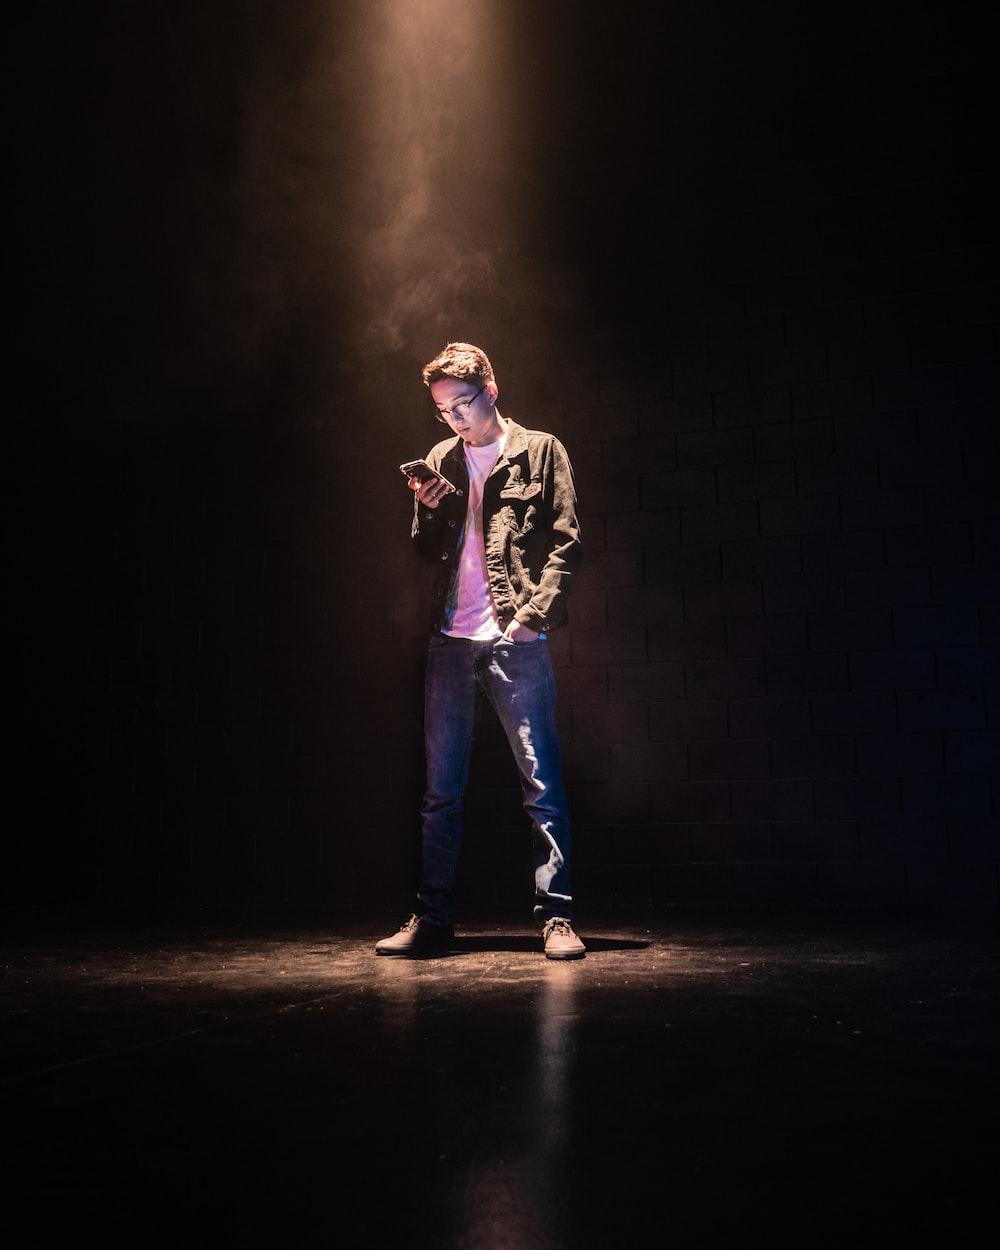 man standing on spotlight using smartphone